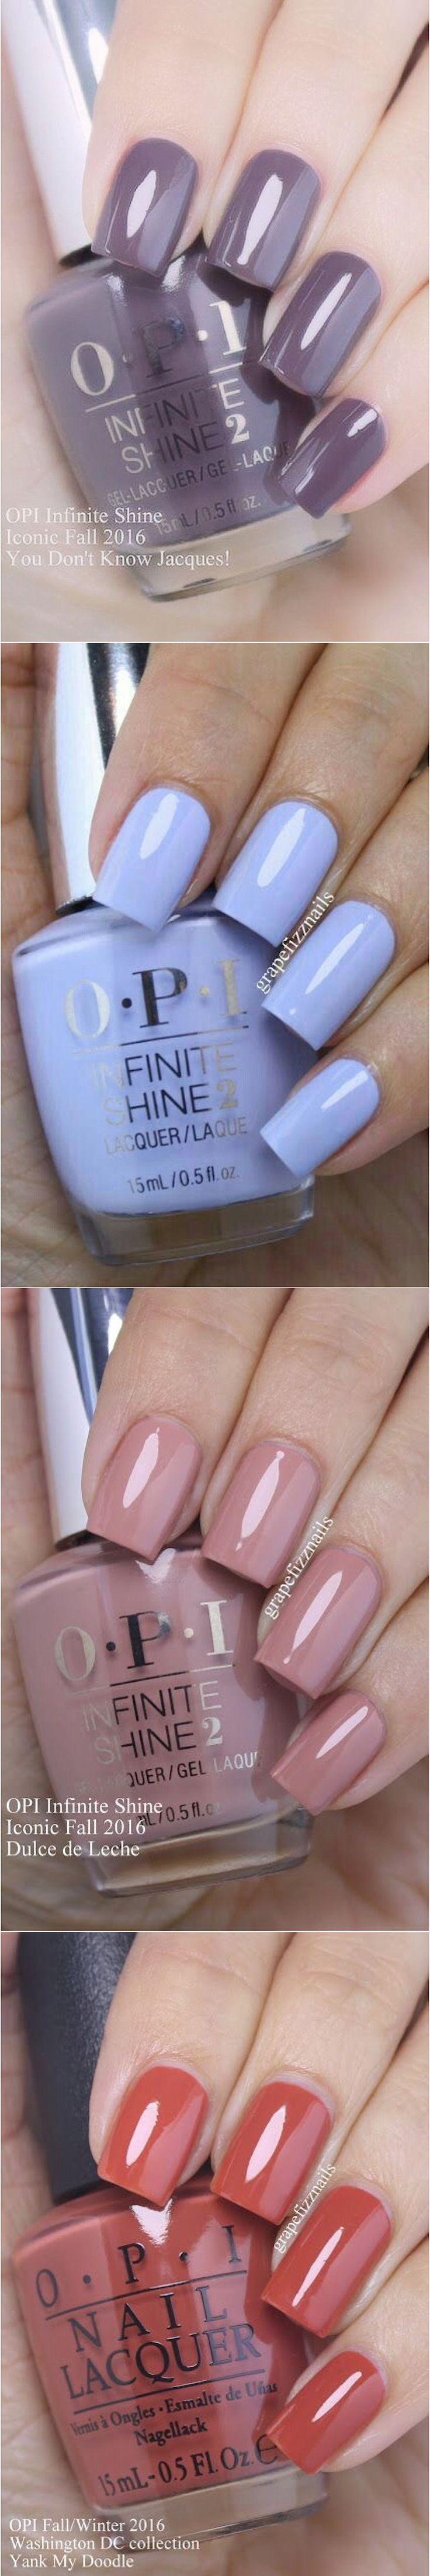 OPI Nail Polish Color Swatches  @grapefizznails